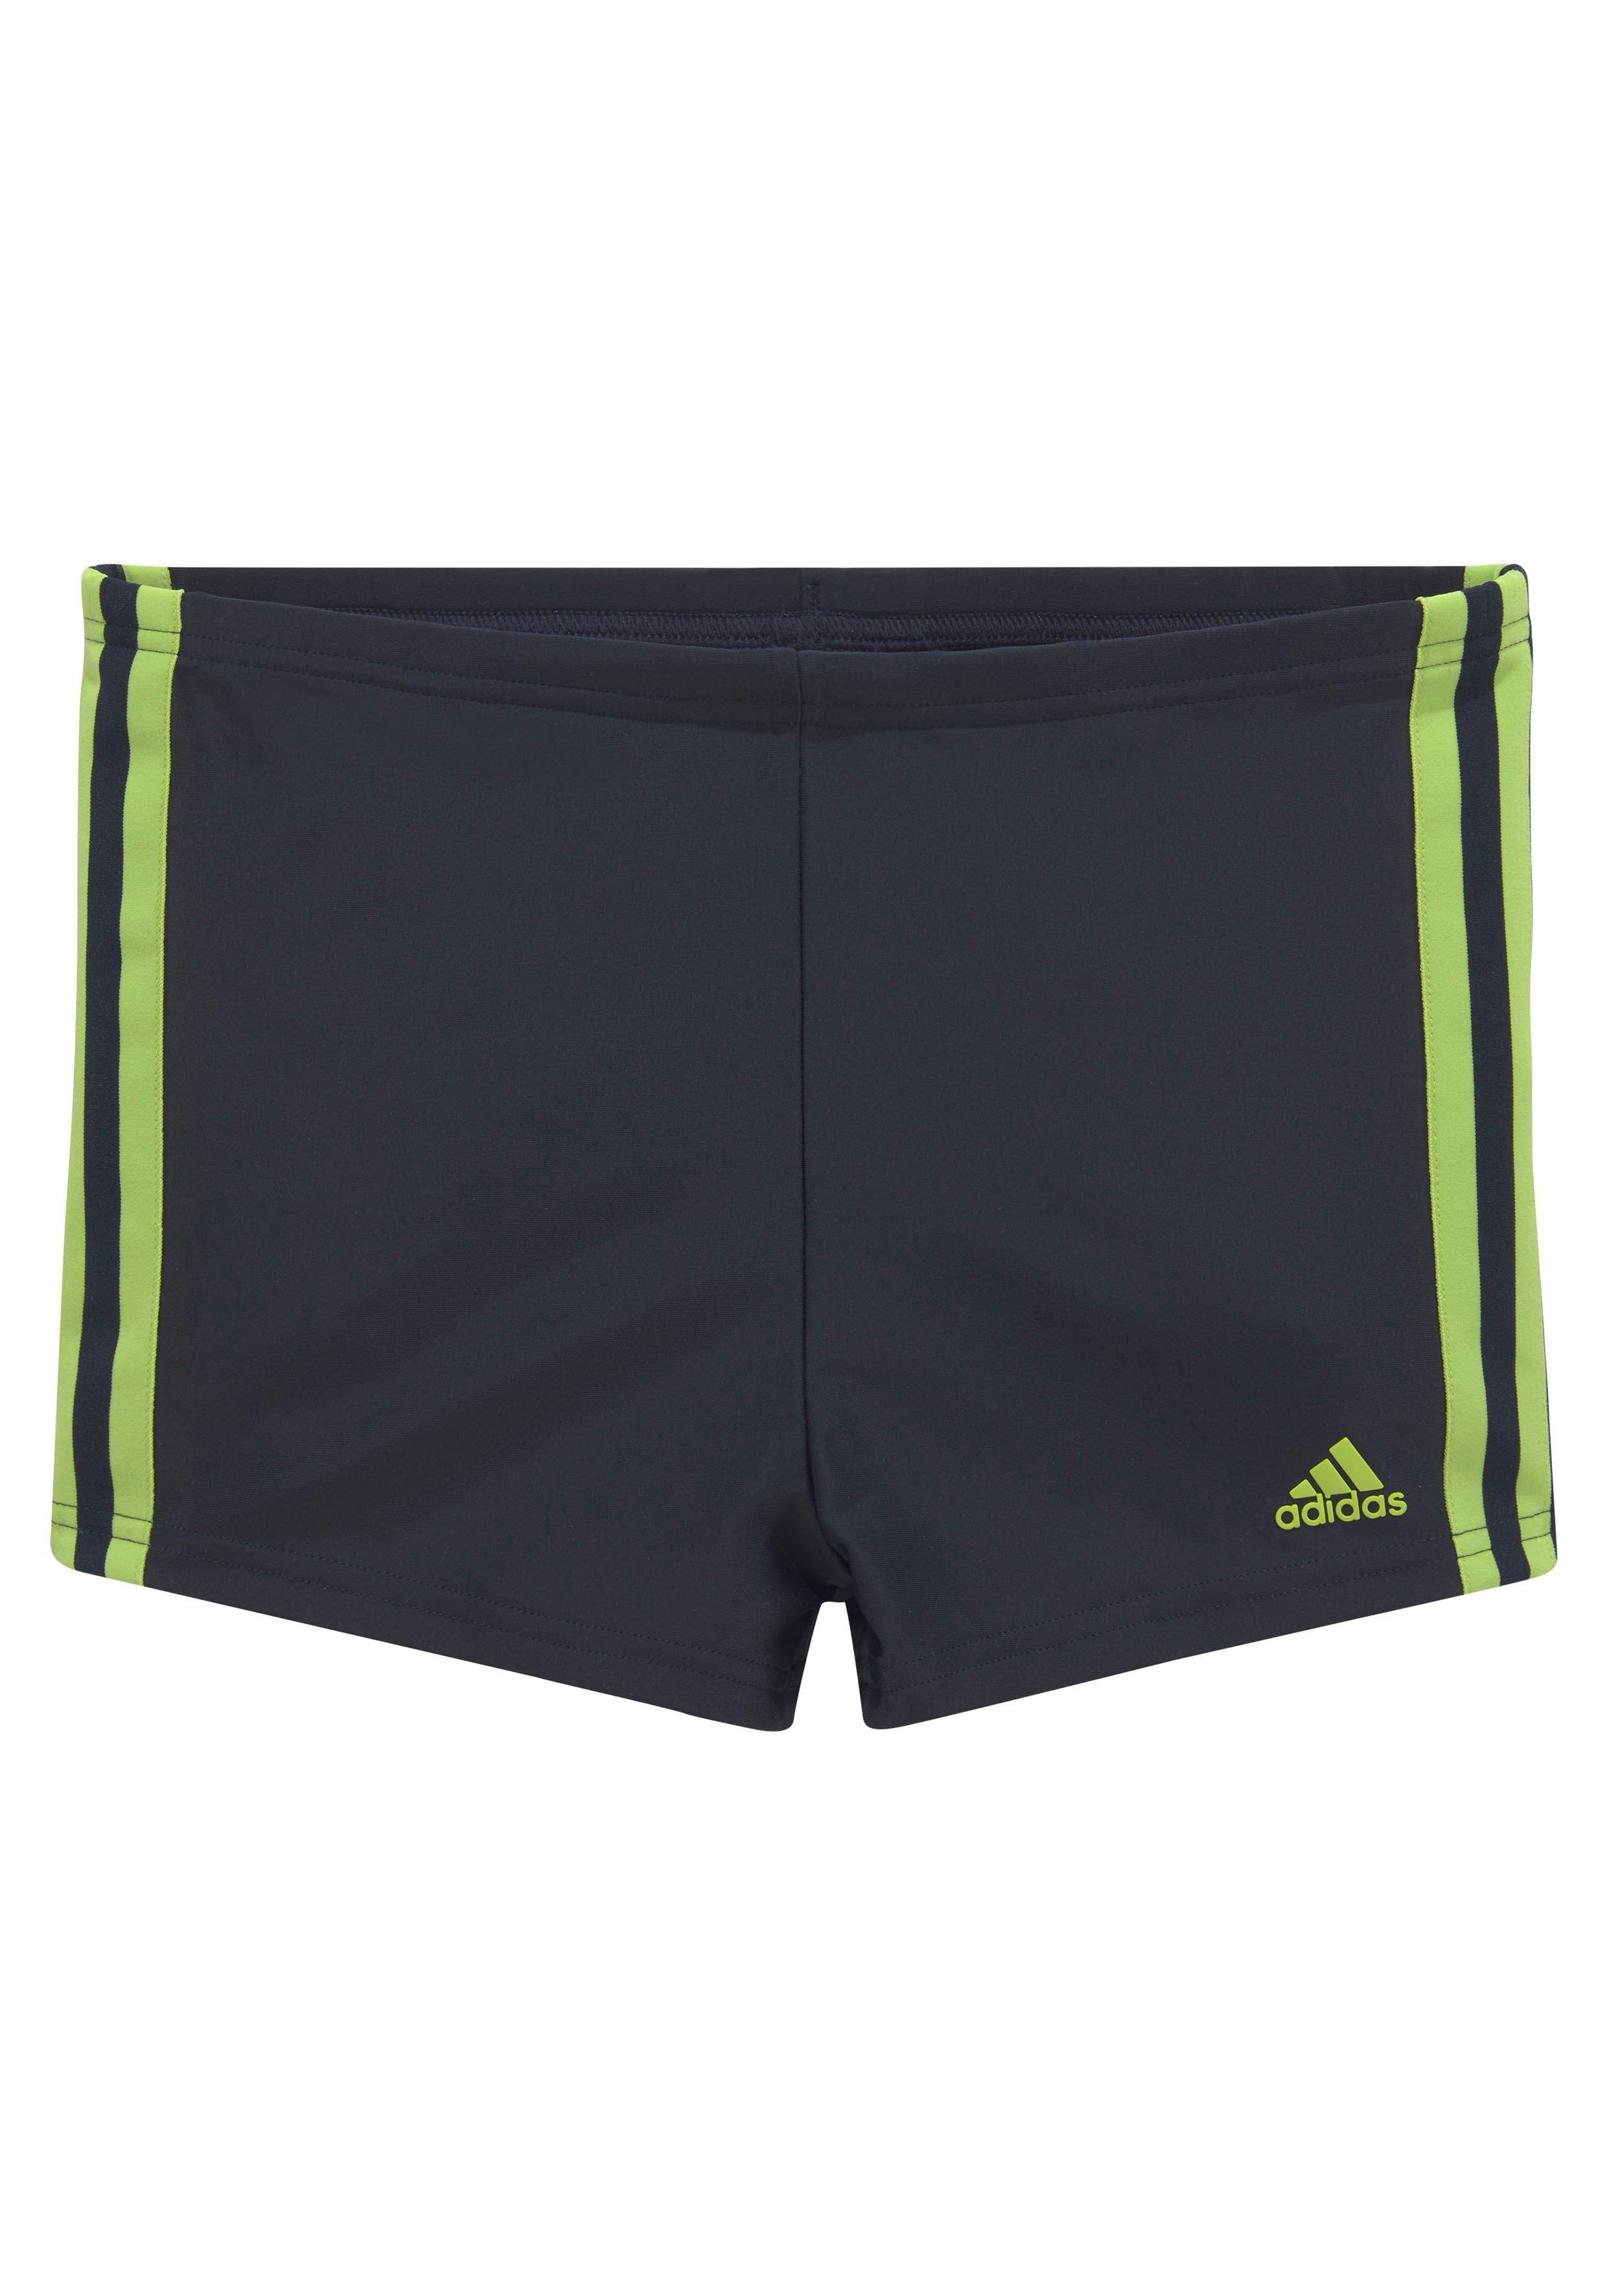 adidas Performance zwemboxer veilig op otto.nl kopen